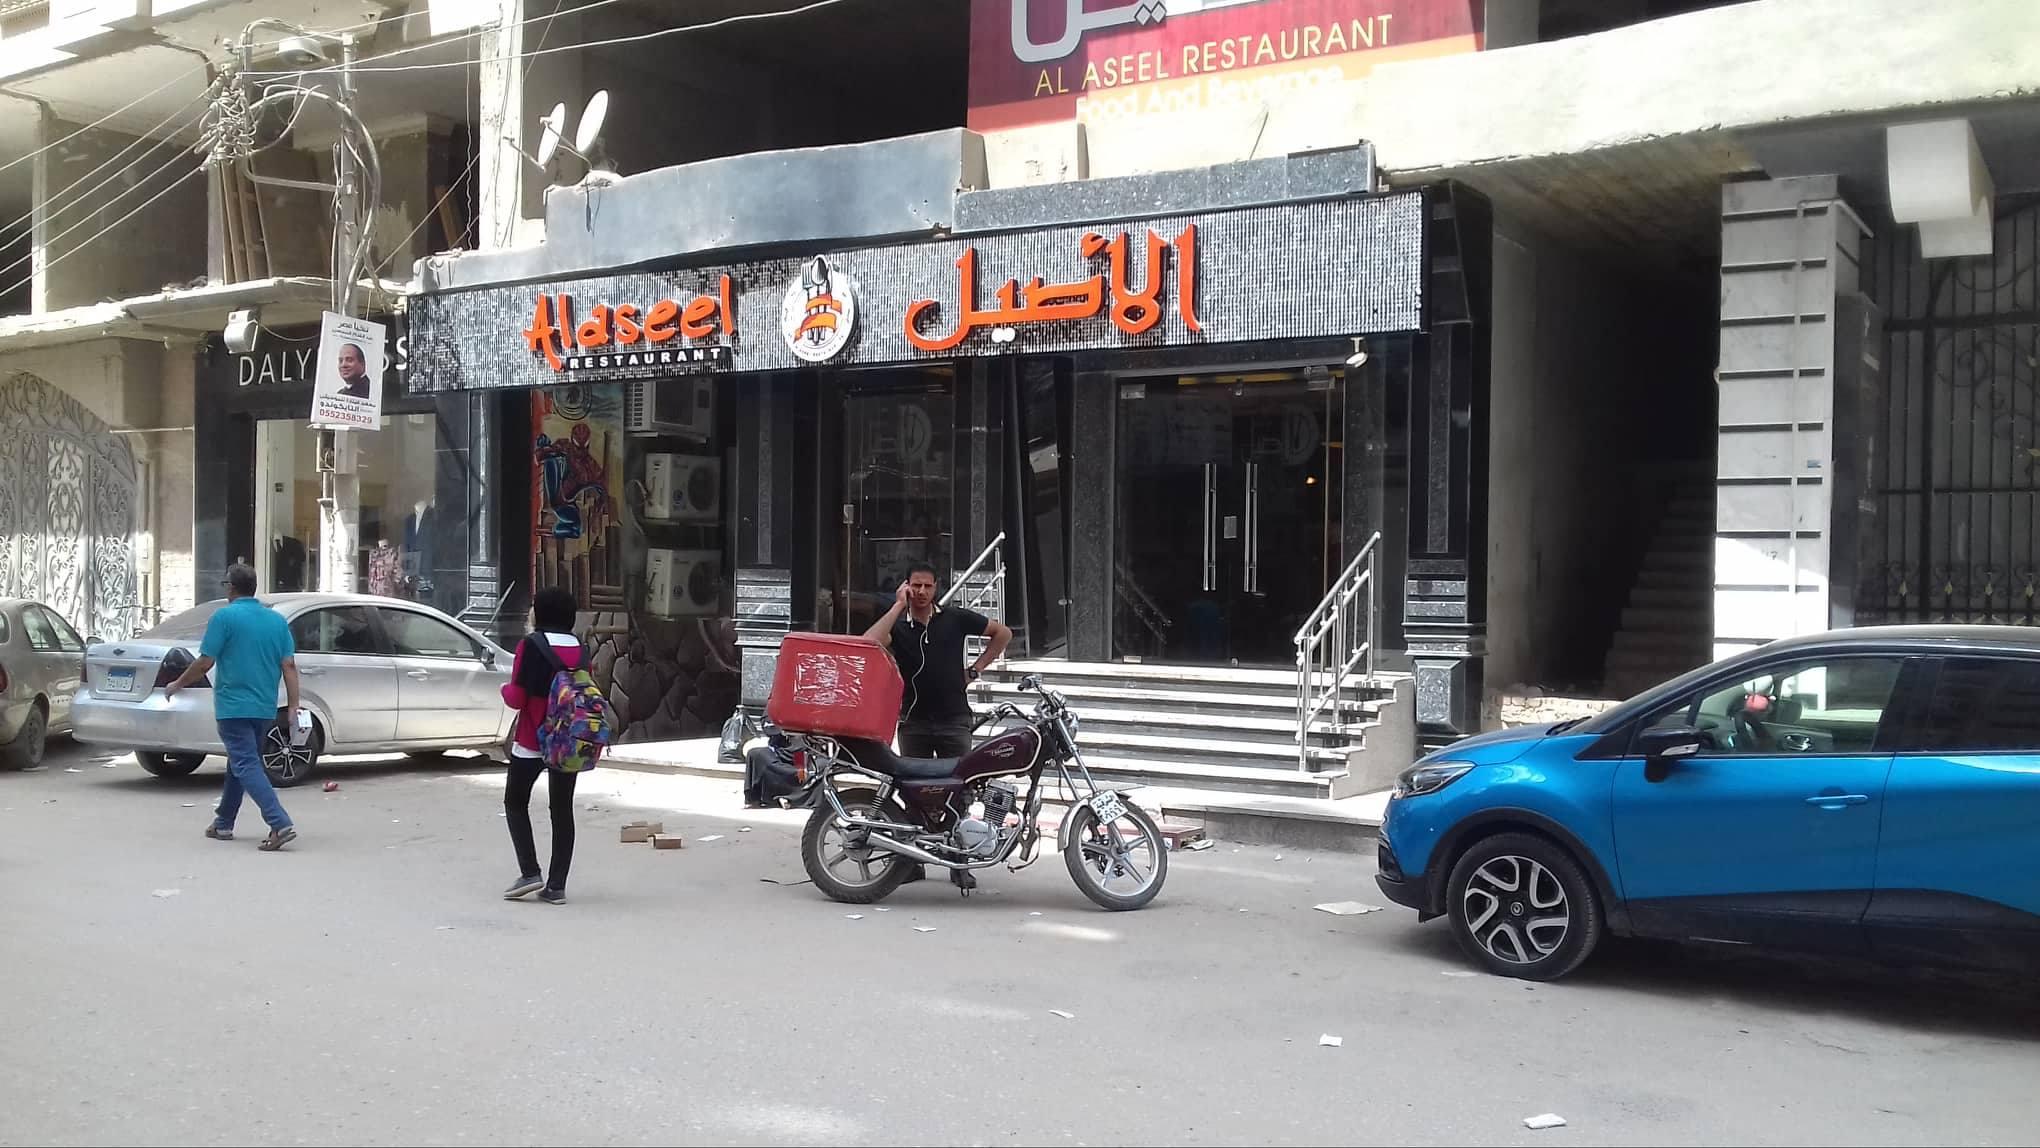 أسعار منيو ورقم وعنوان فروع مطعم الاصيل Al Aseel